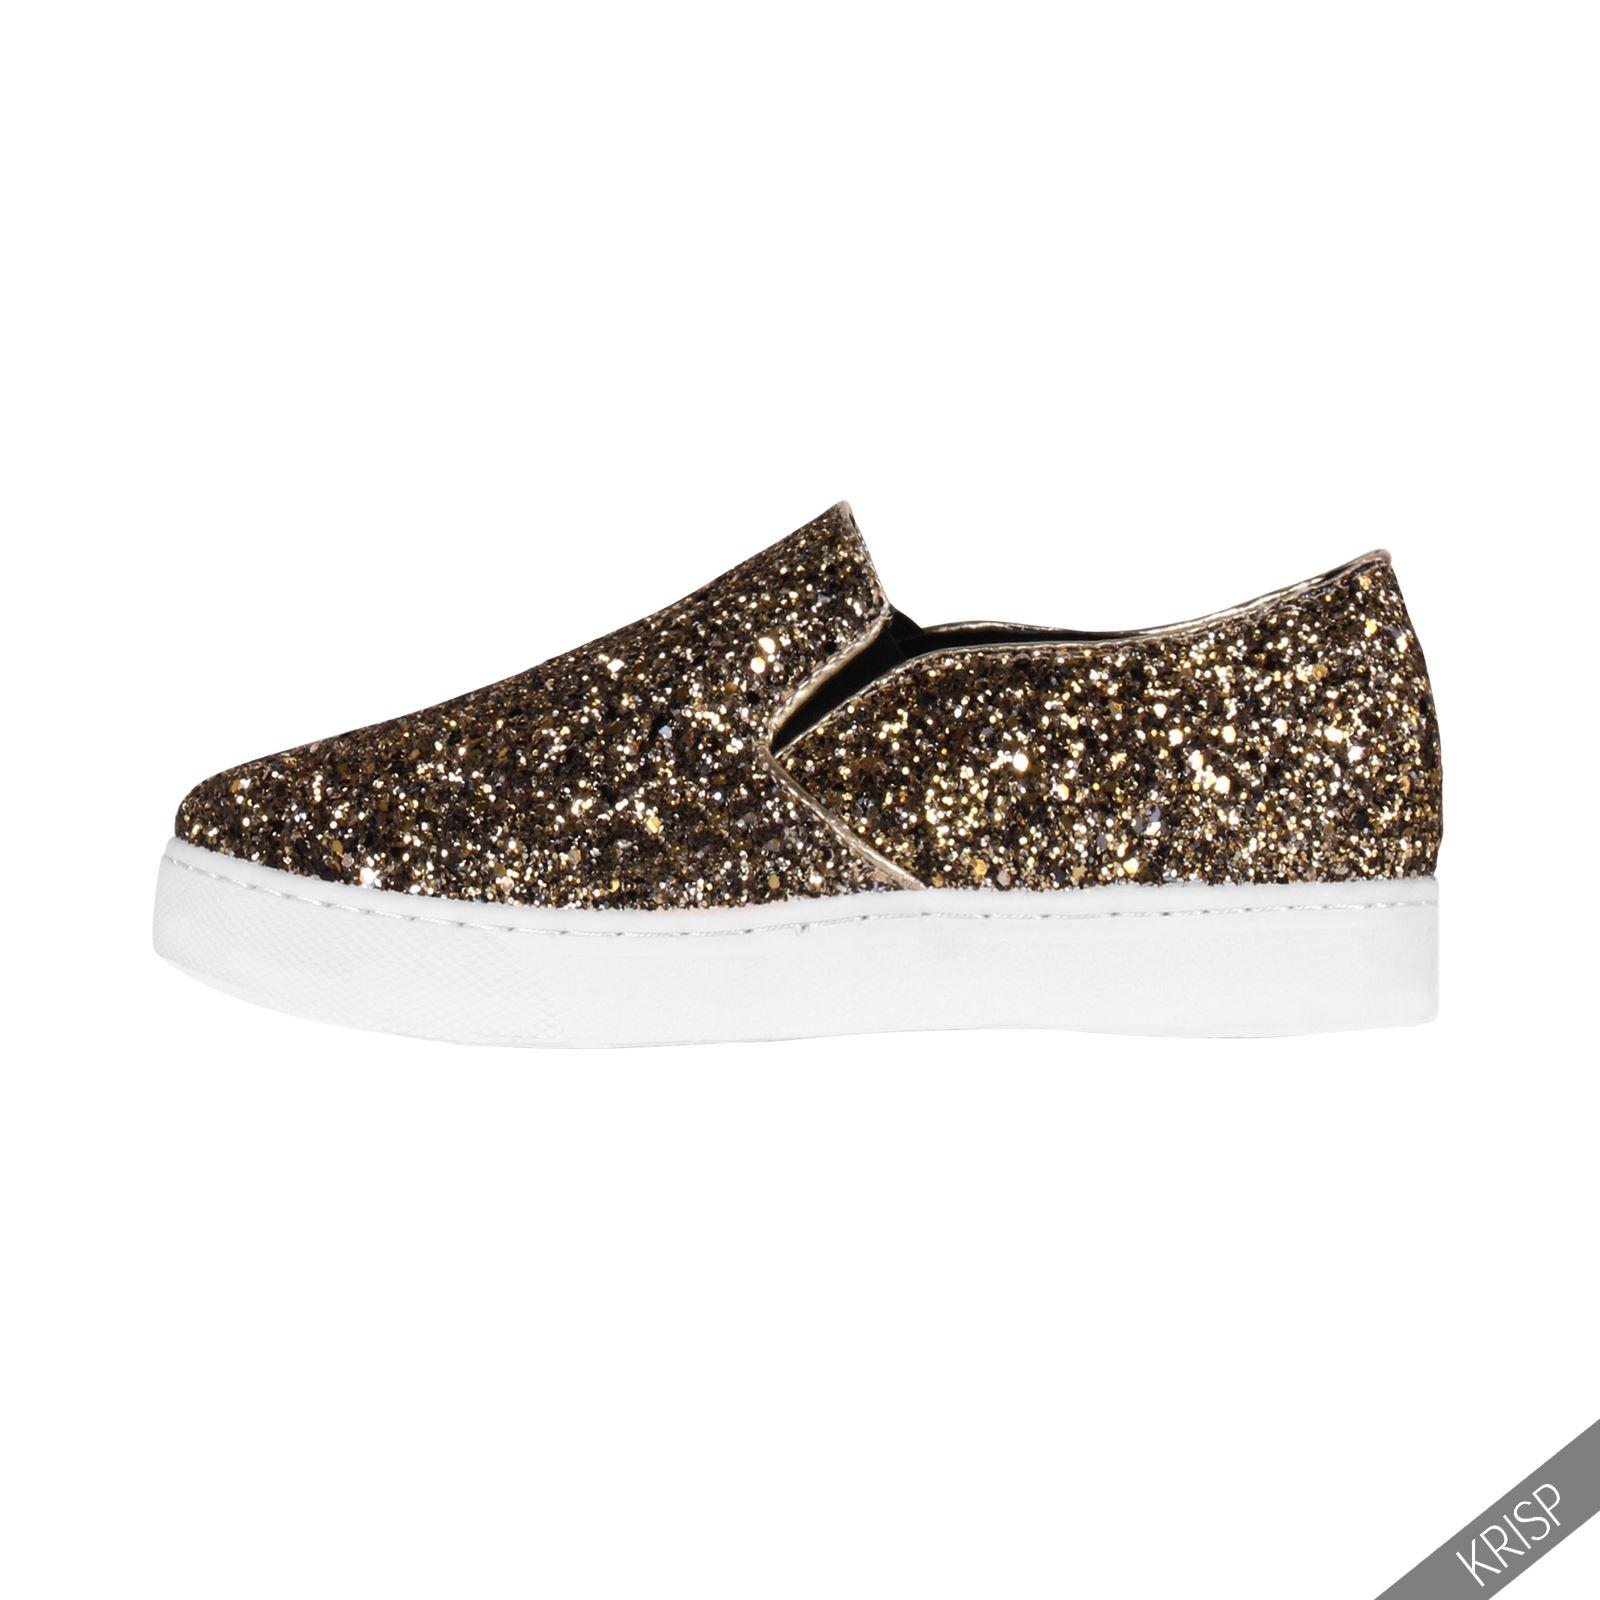 Damen Metallic Sneaker Glitzer Schuhe Flache Plateauschuhe Party Turnschuhe